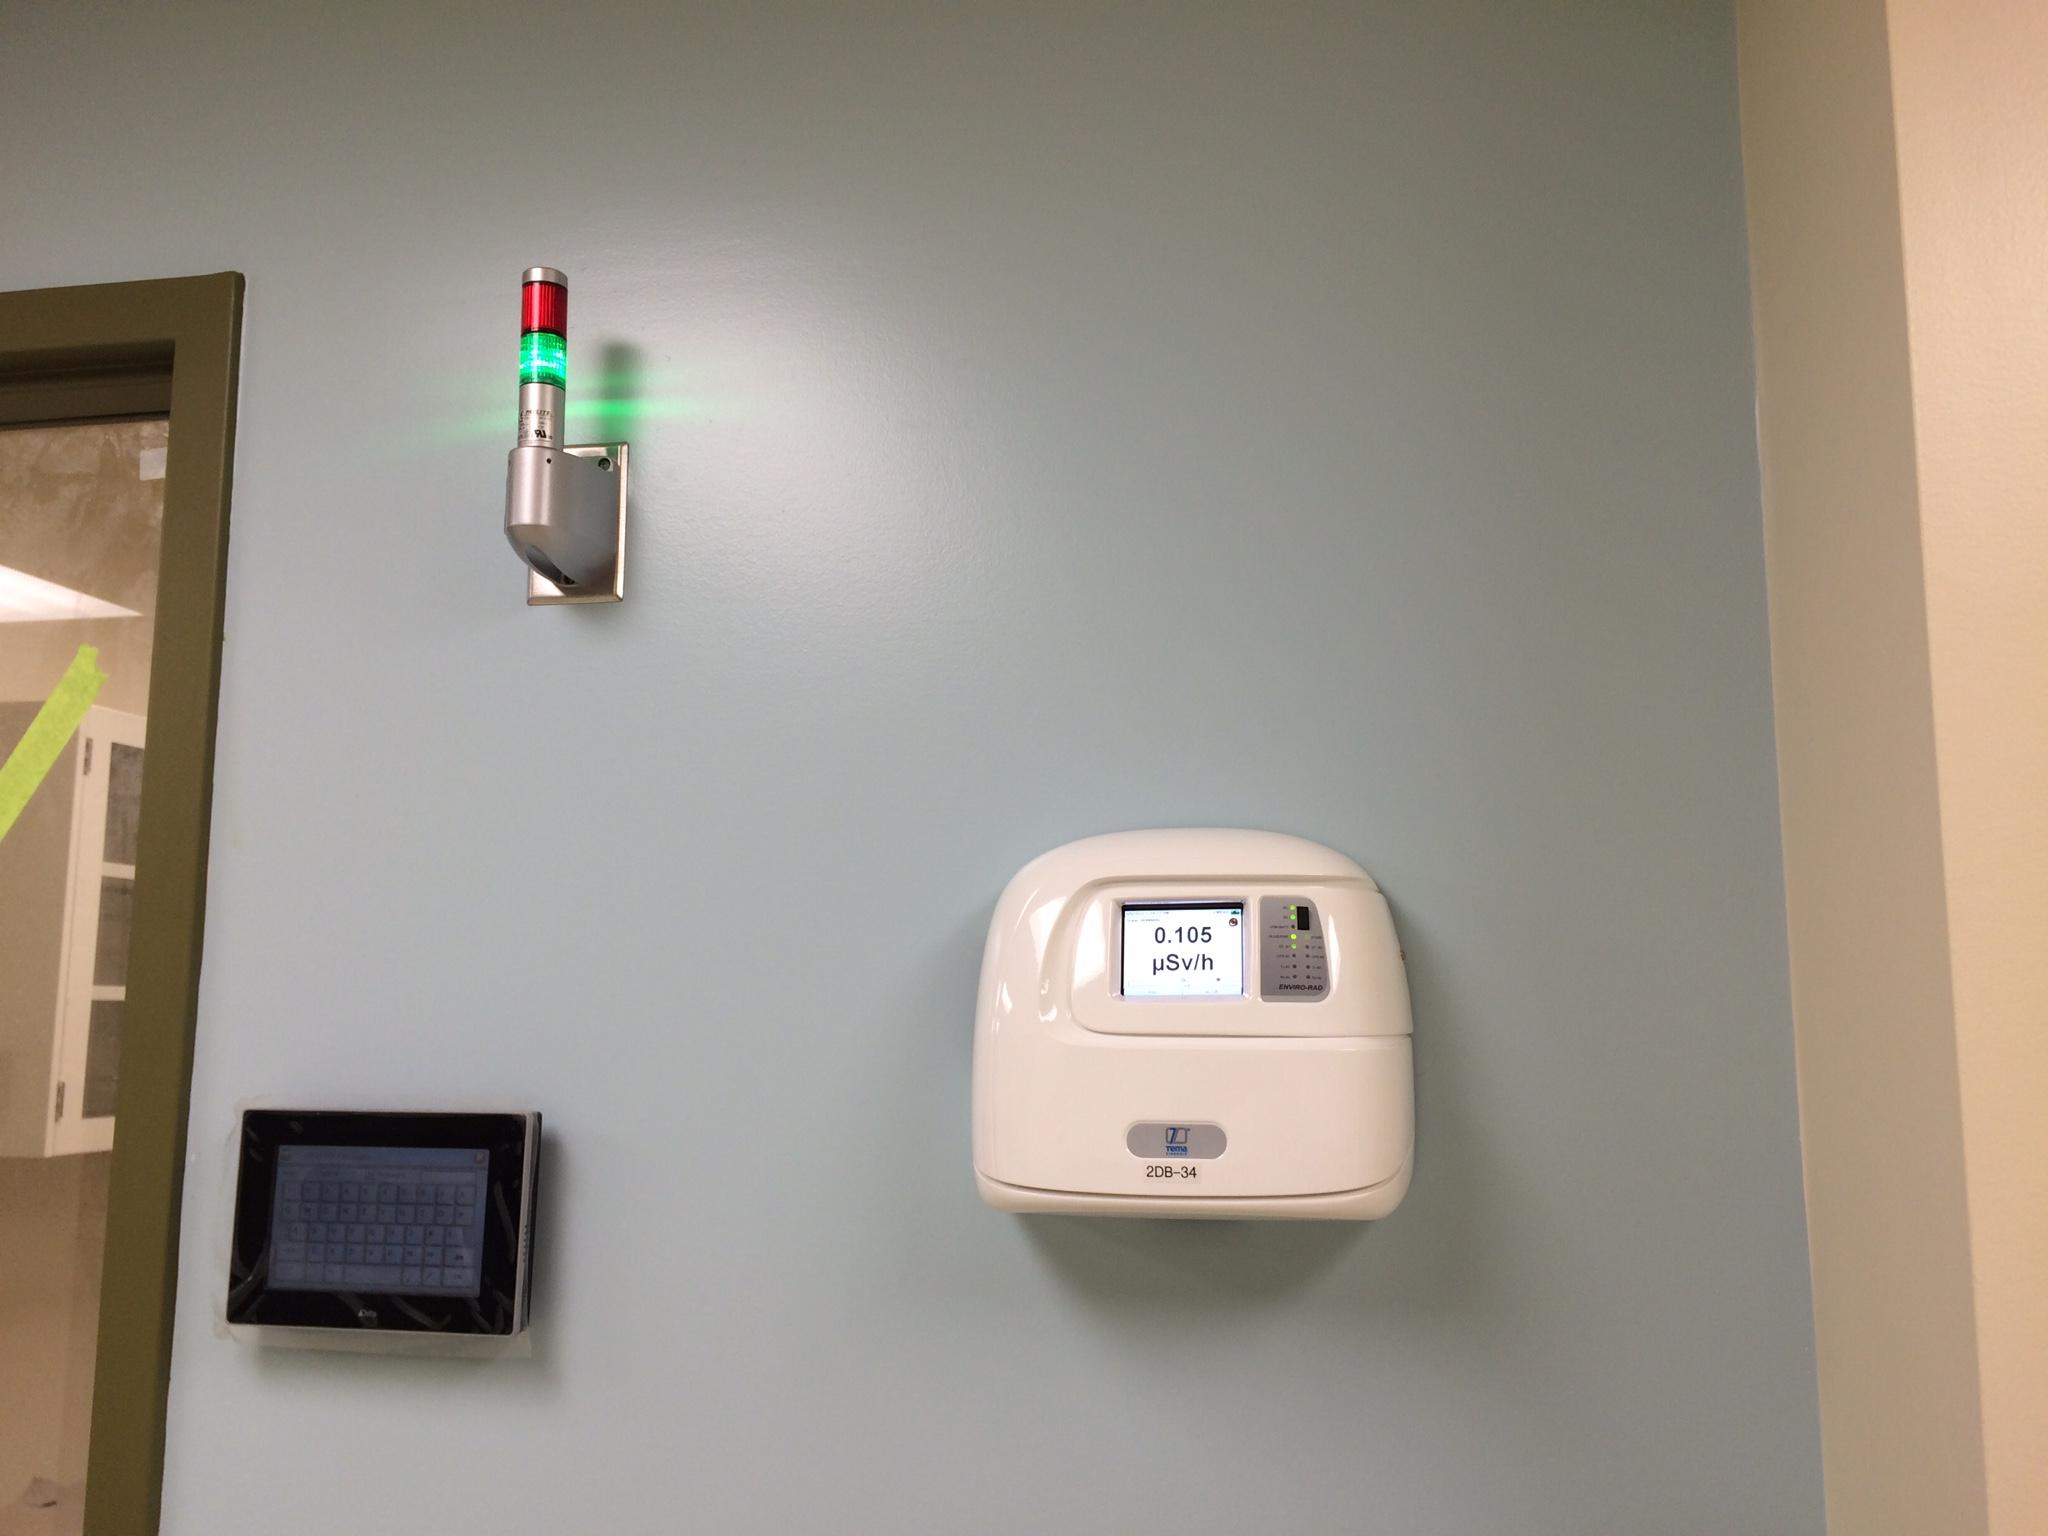 Area radiation monitor